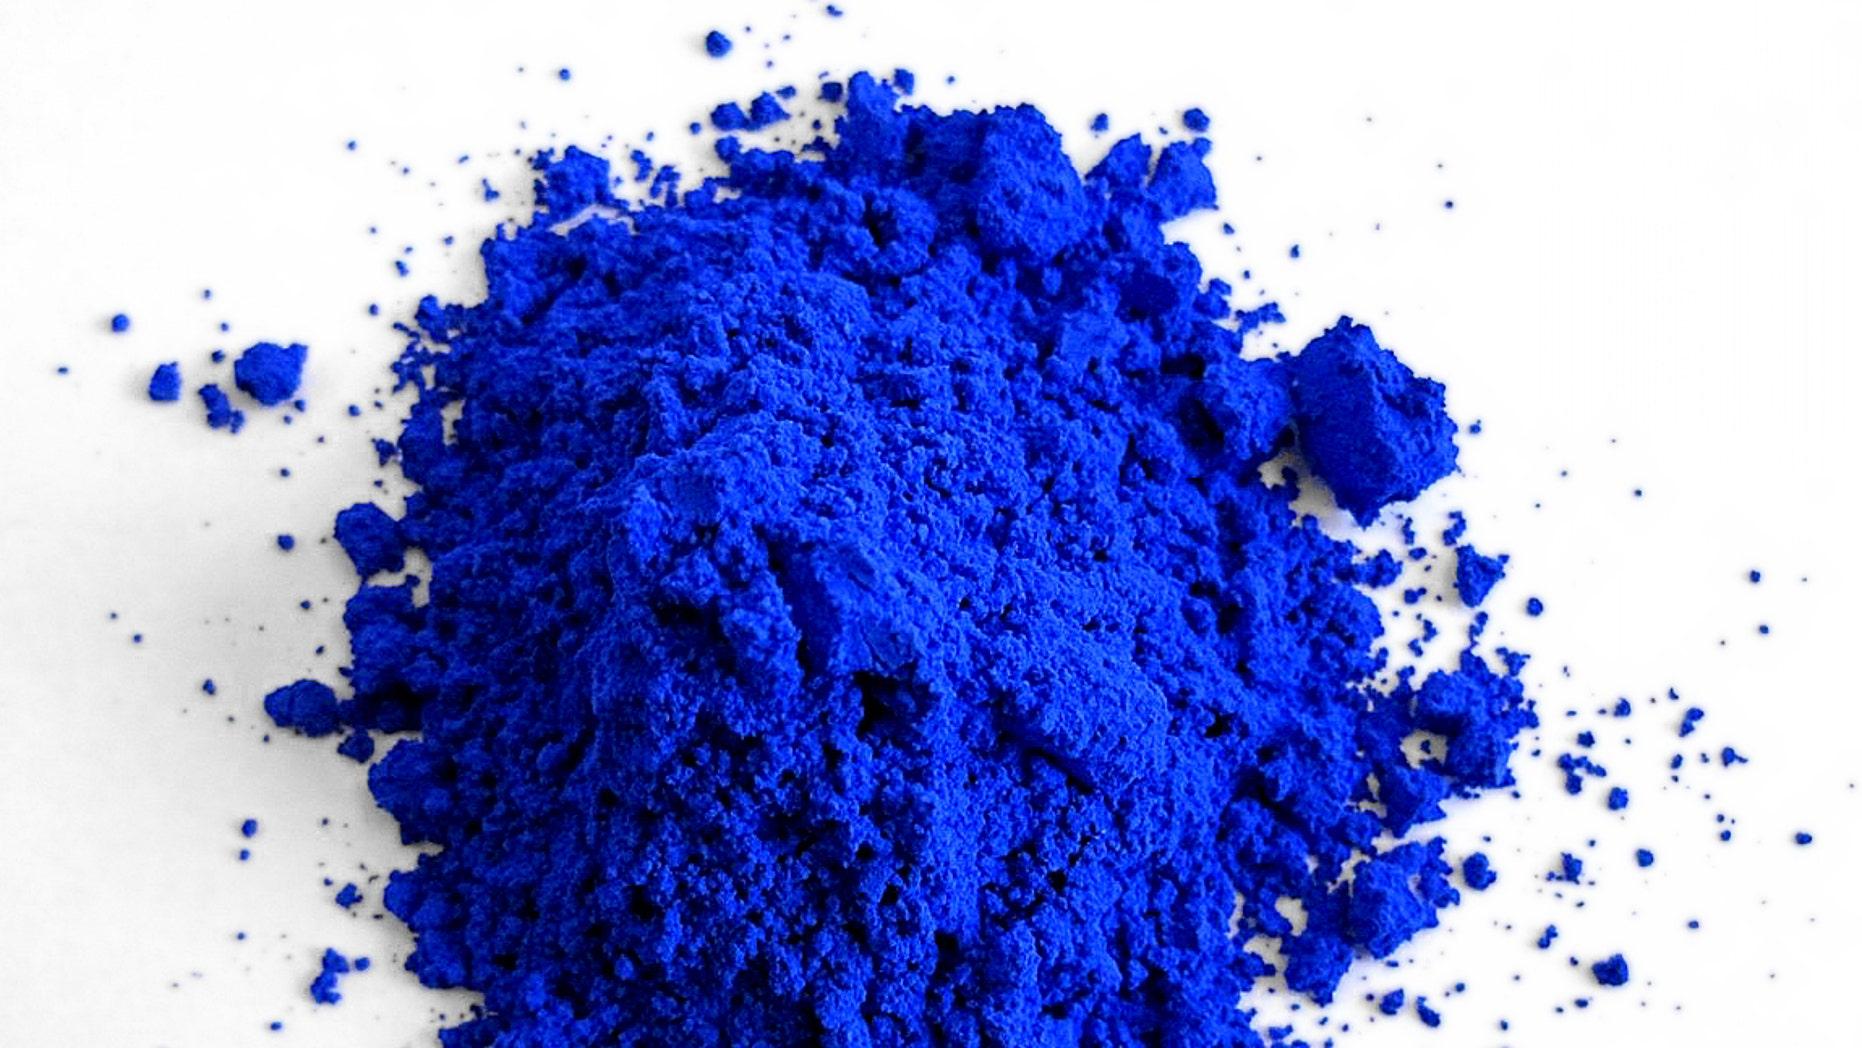 YInMn Blue (Oregon State University).